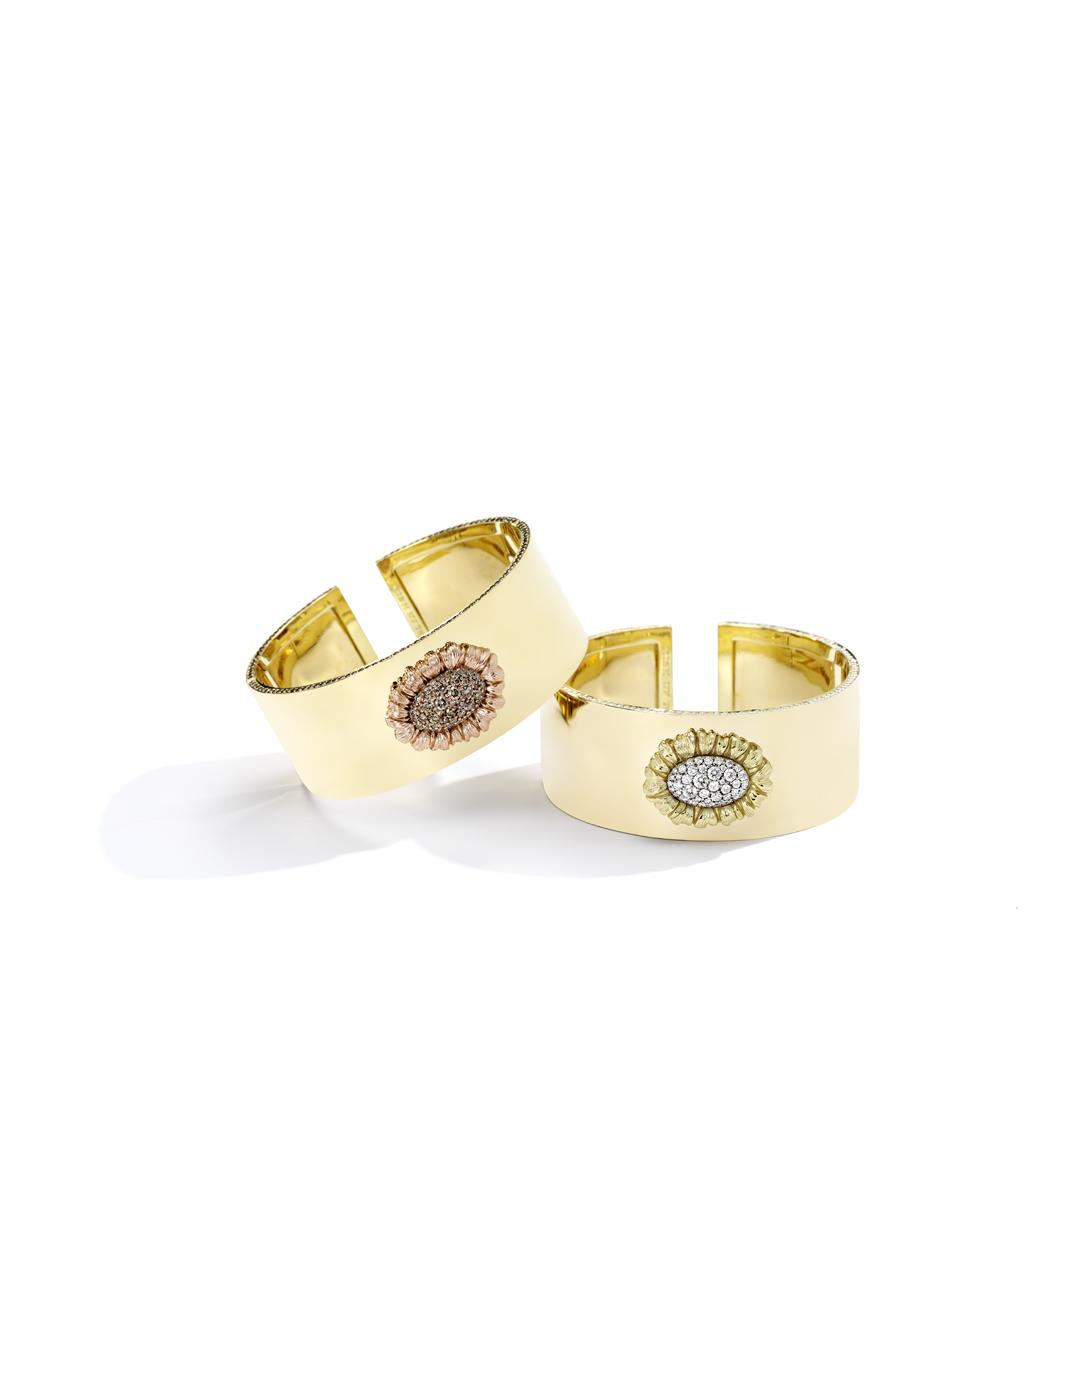 mish_jewelry_product_Nigella-RG-Cuff-2